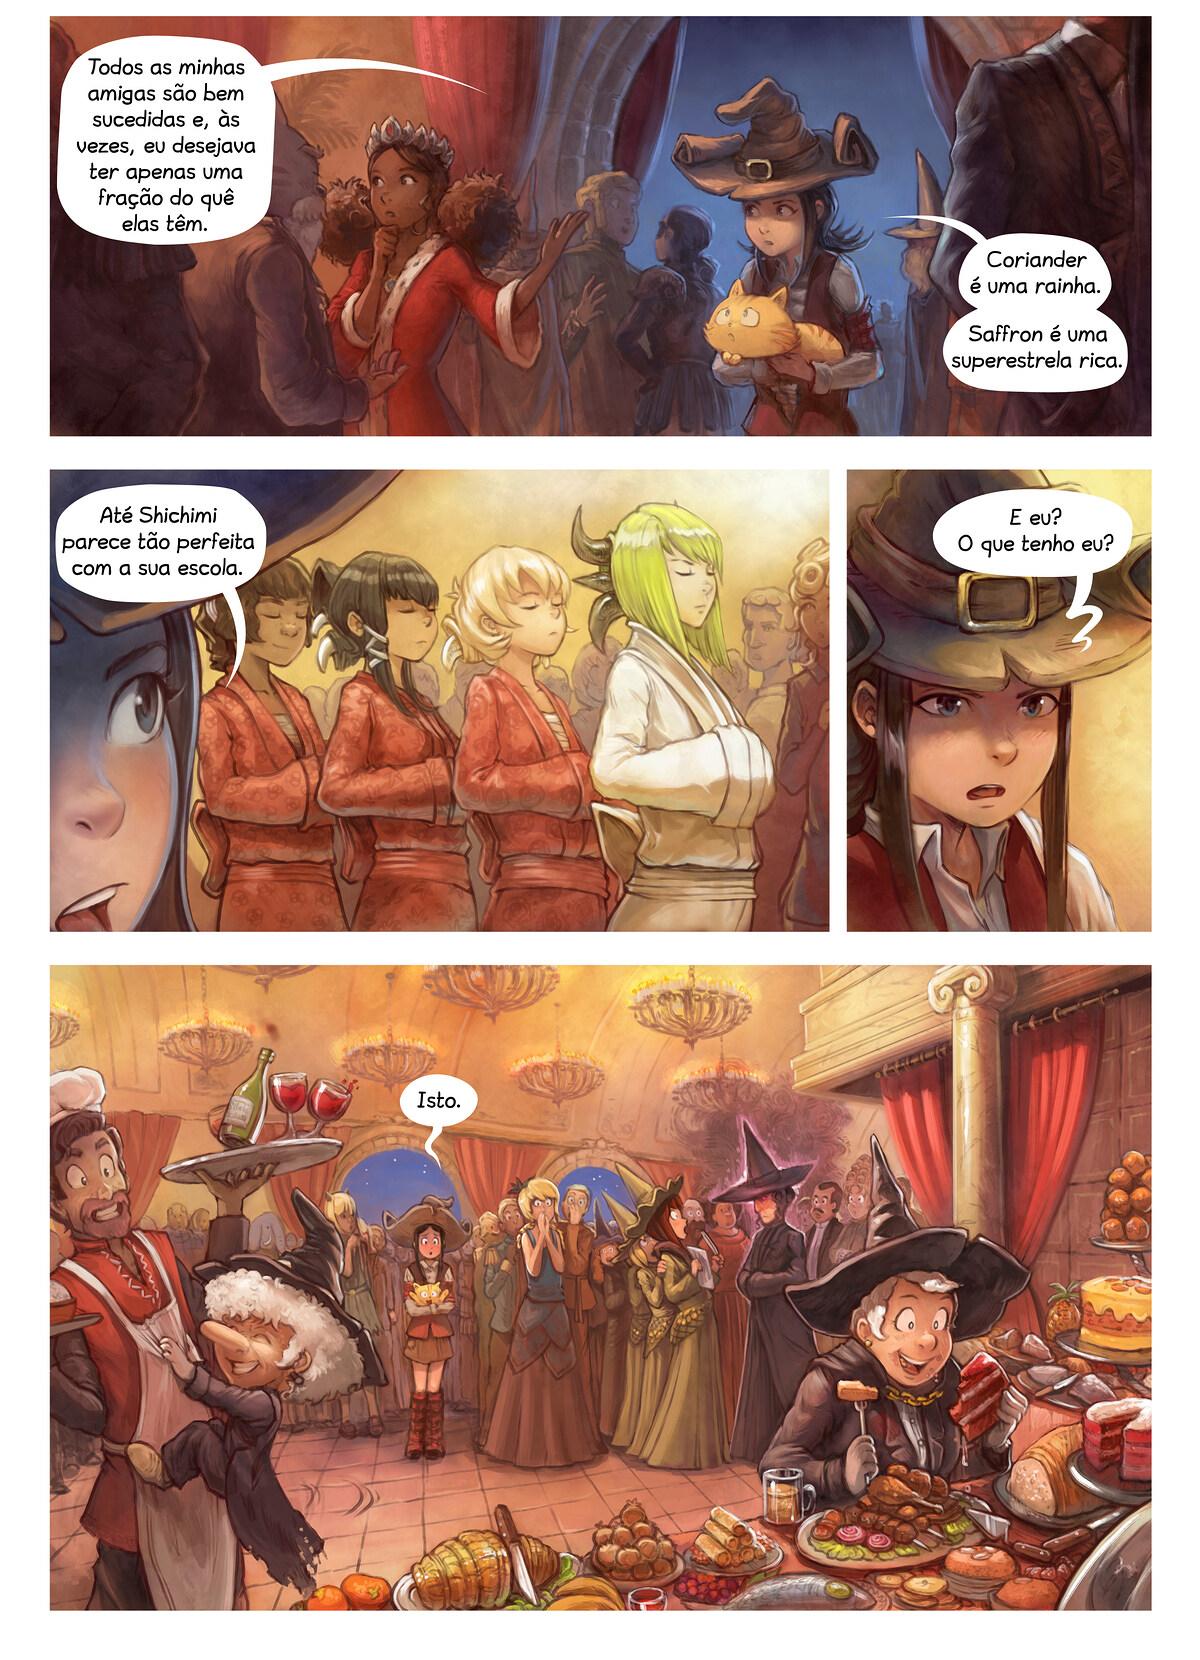 A webcomic page of Pepper&Carrot, episódio 28 [pt], página 5